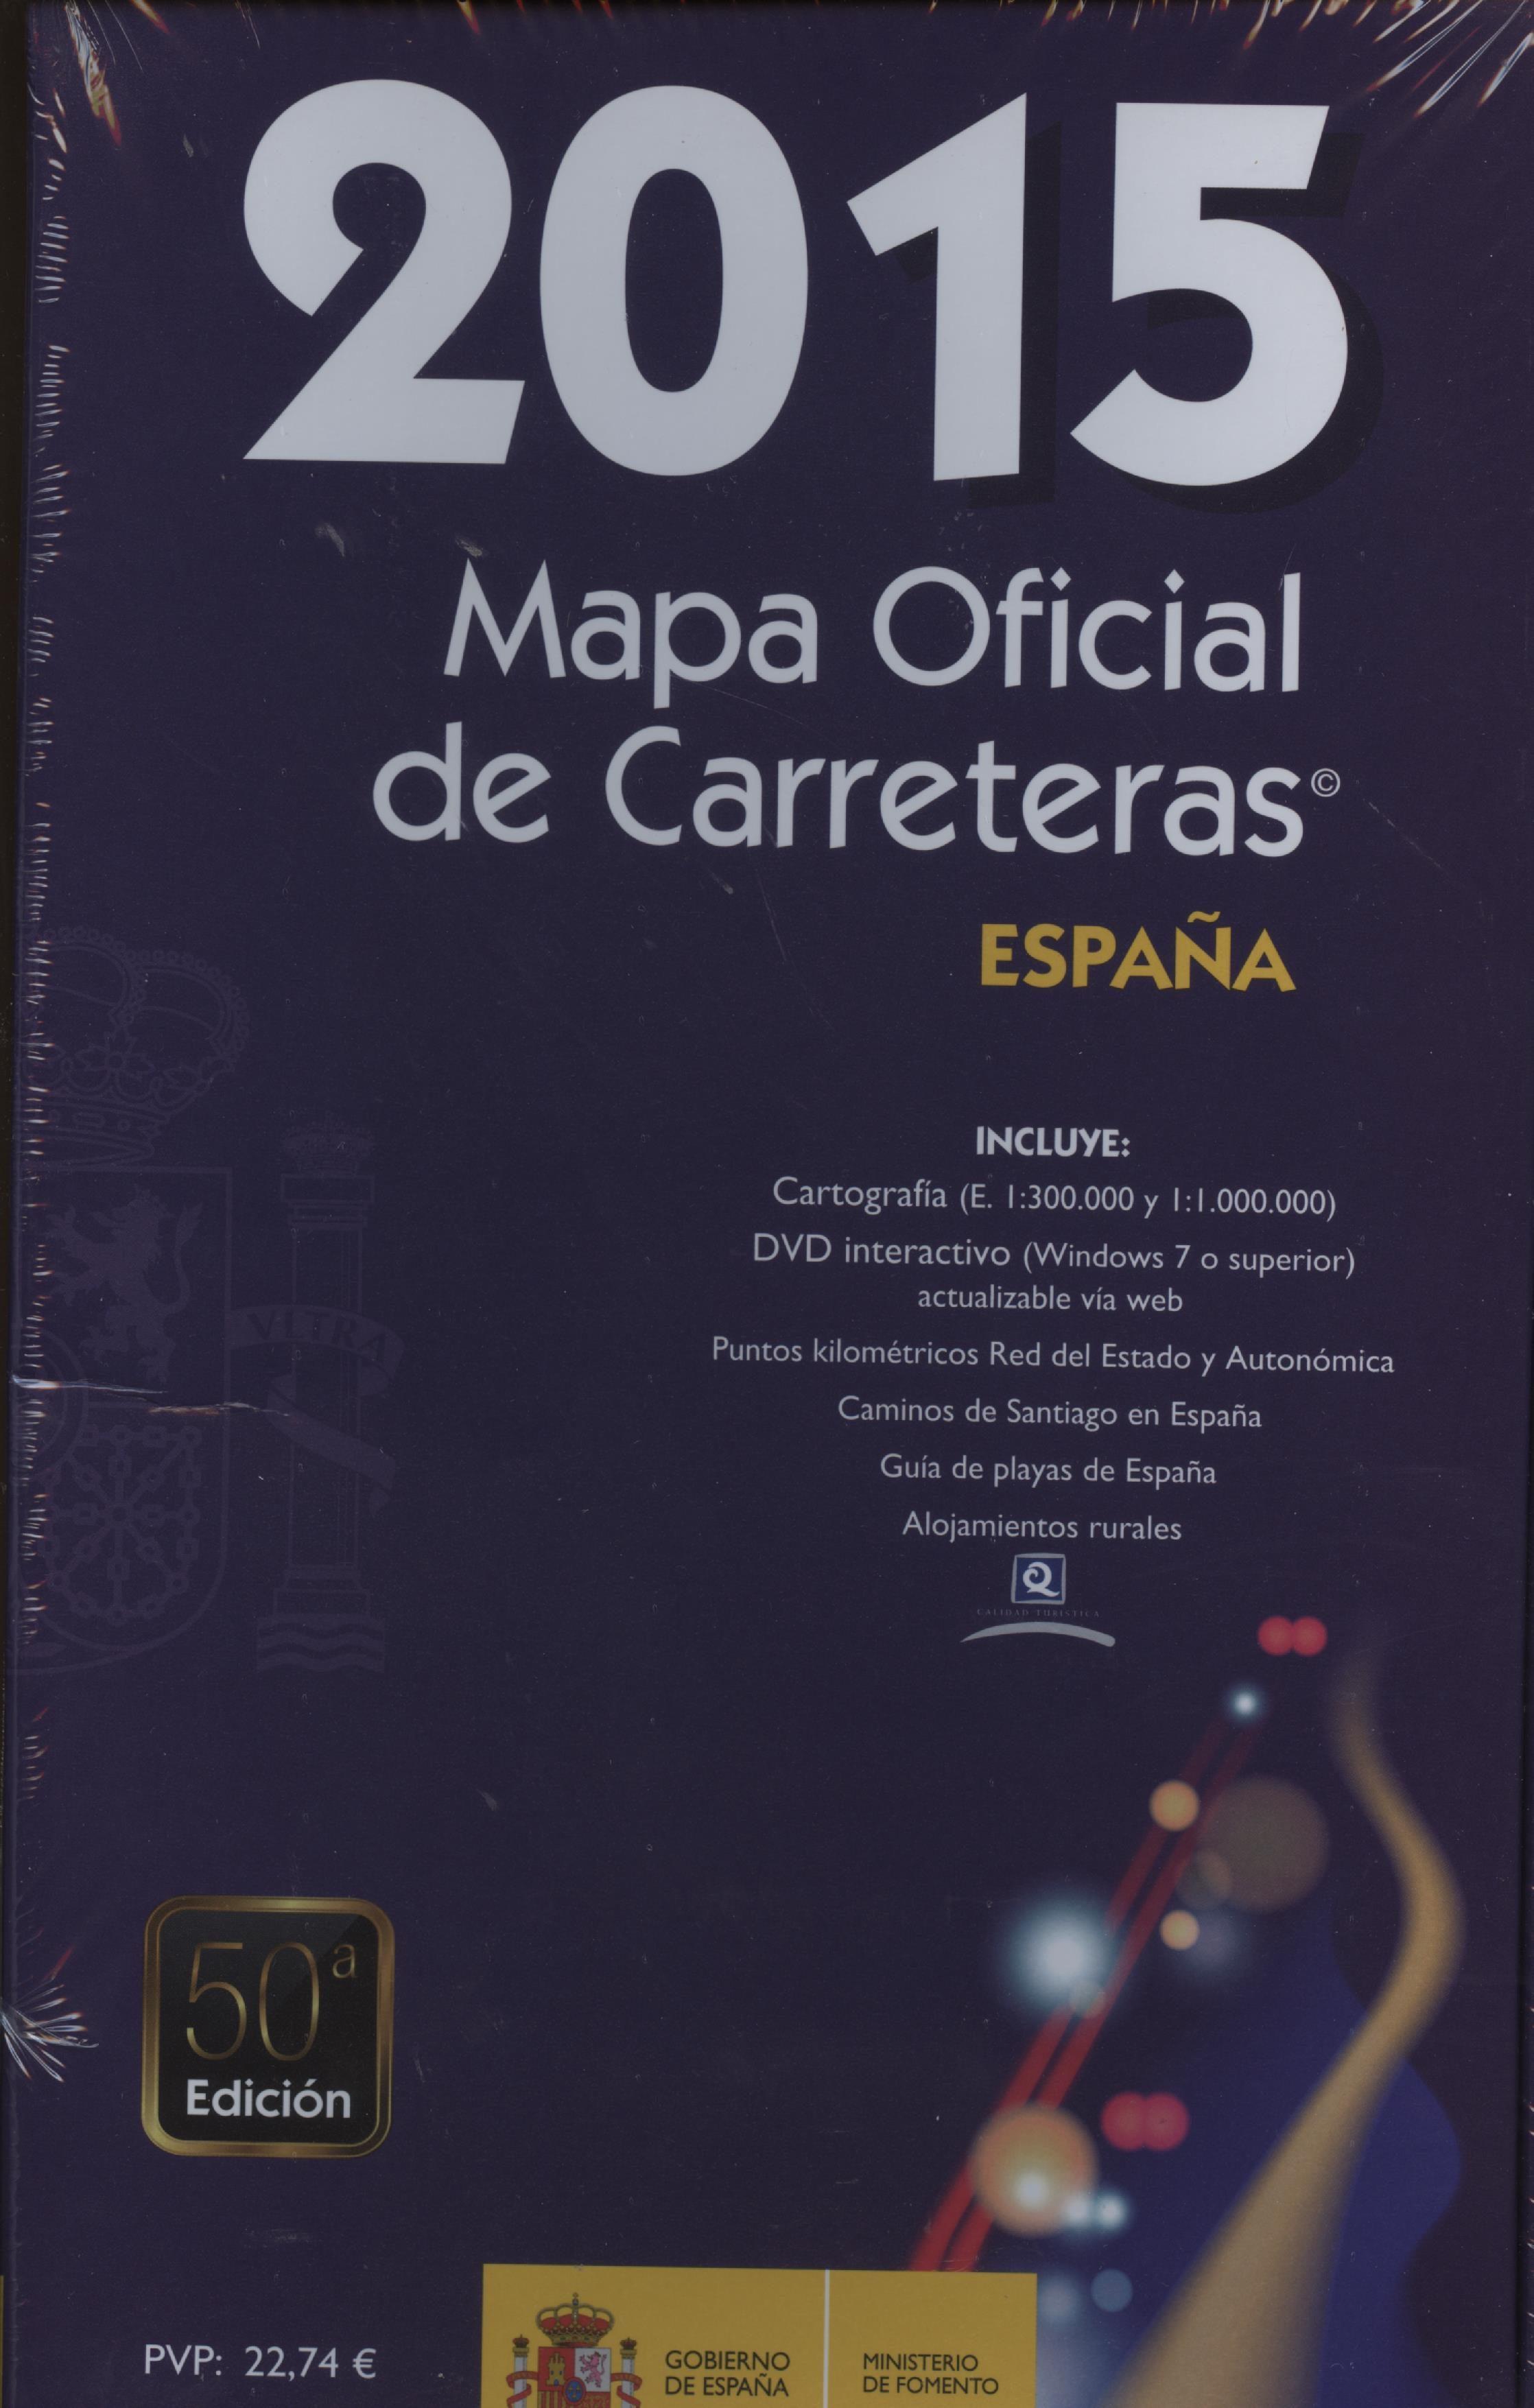 MAPA OFICIAL DE CARRETERAS ESPAA 2015 50 ED  VVAA